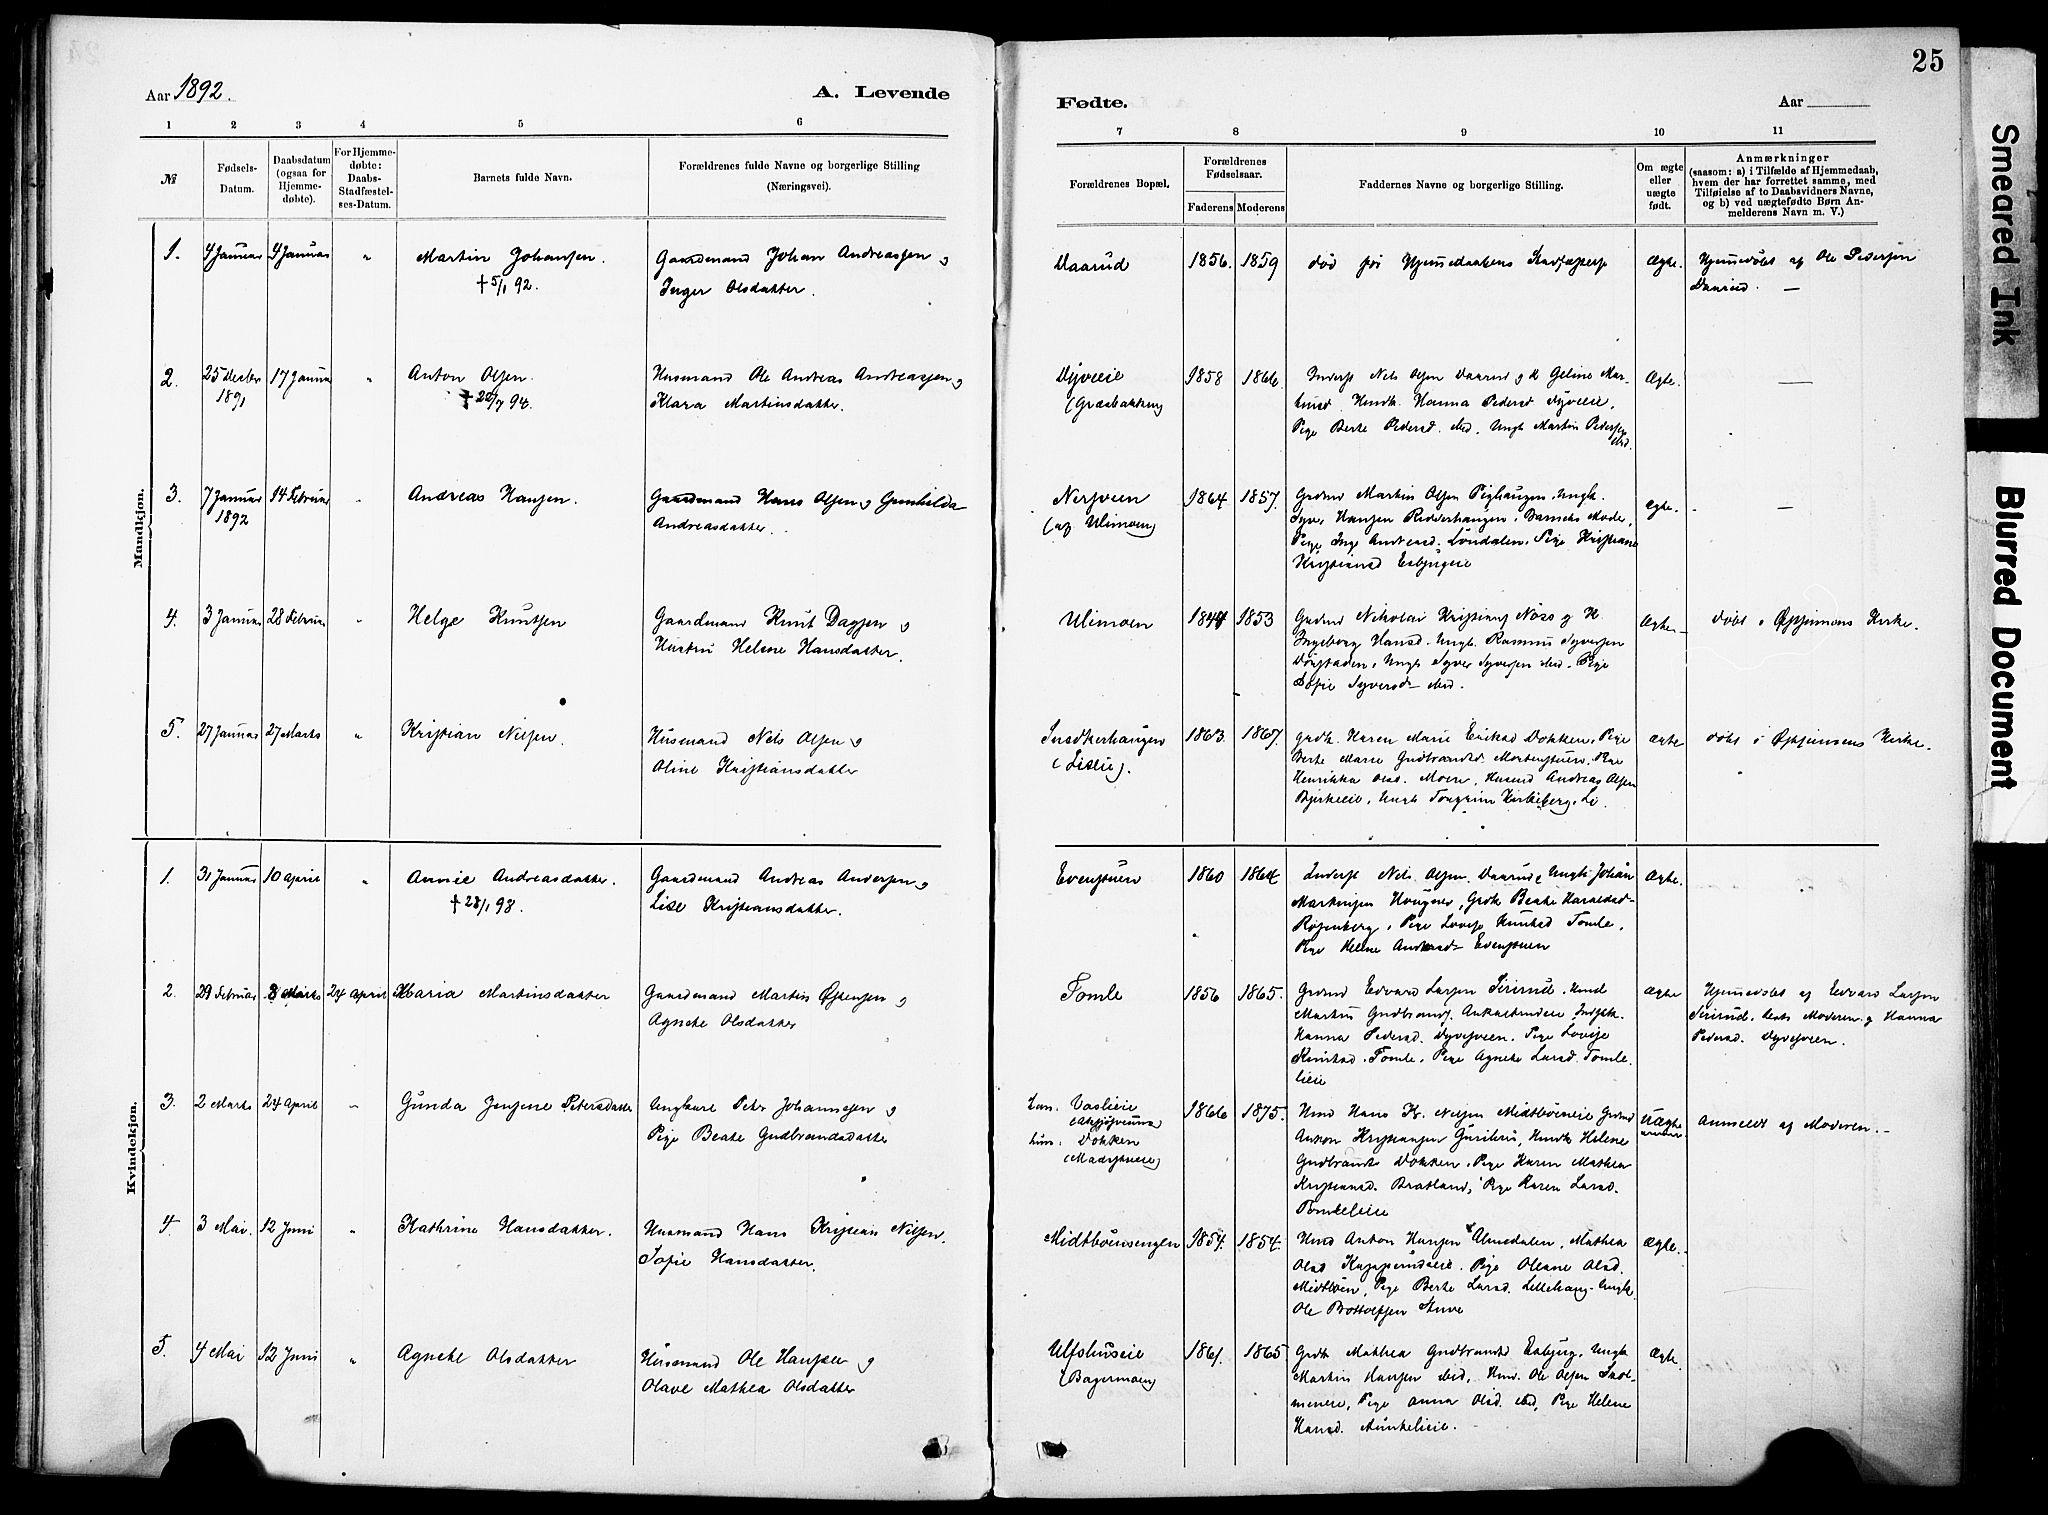 SAH, Nordre Land prestekontor, Ministerialbok nr. 5, 1882-1903, s. 25